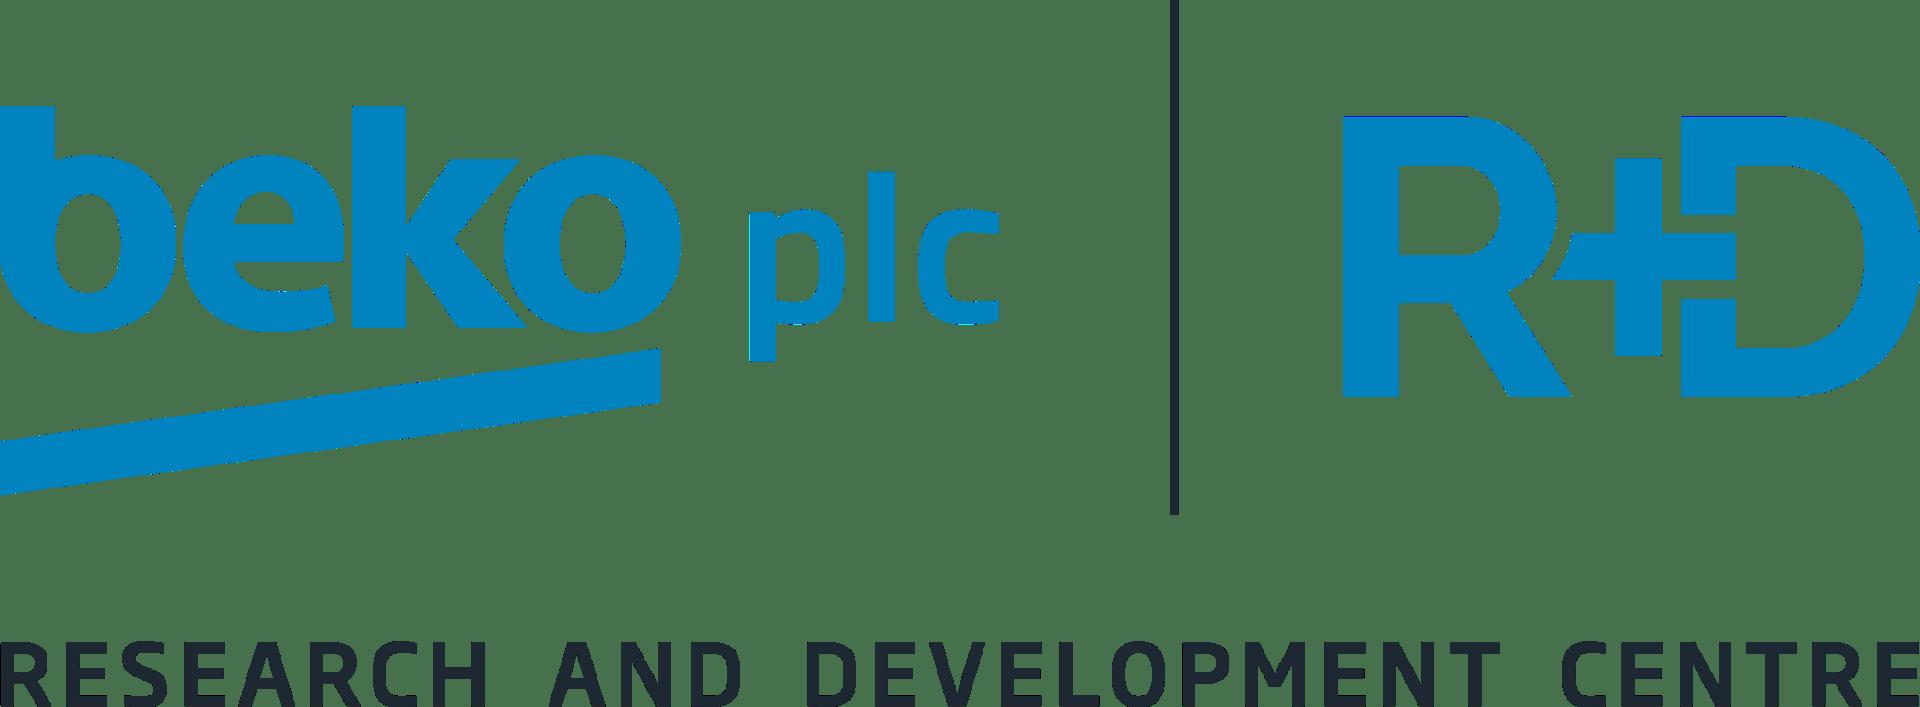 Beko Research and Development Centre logo